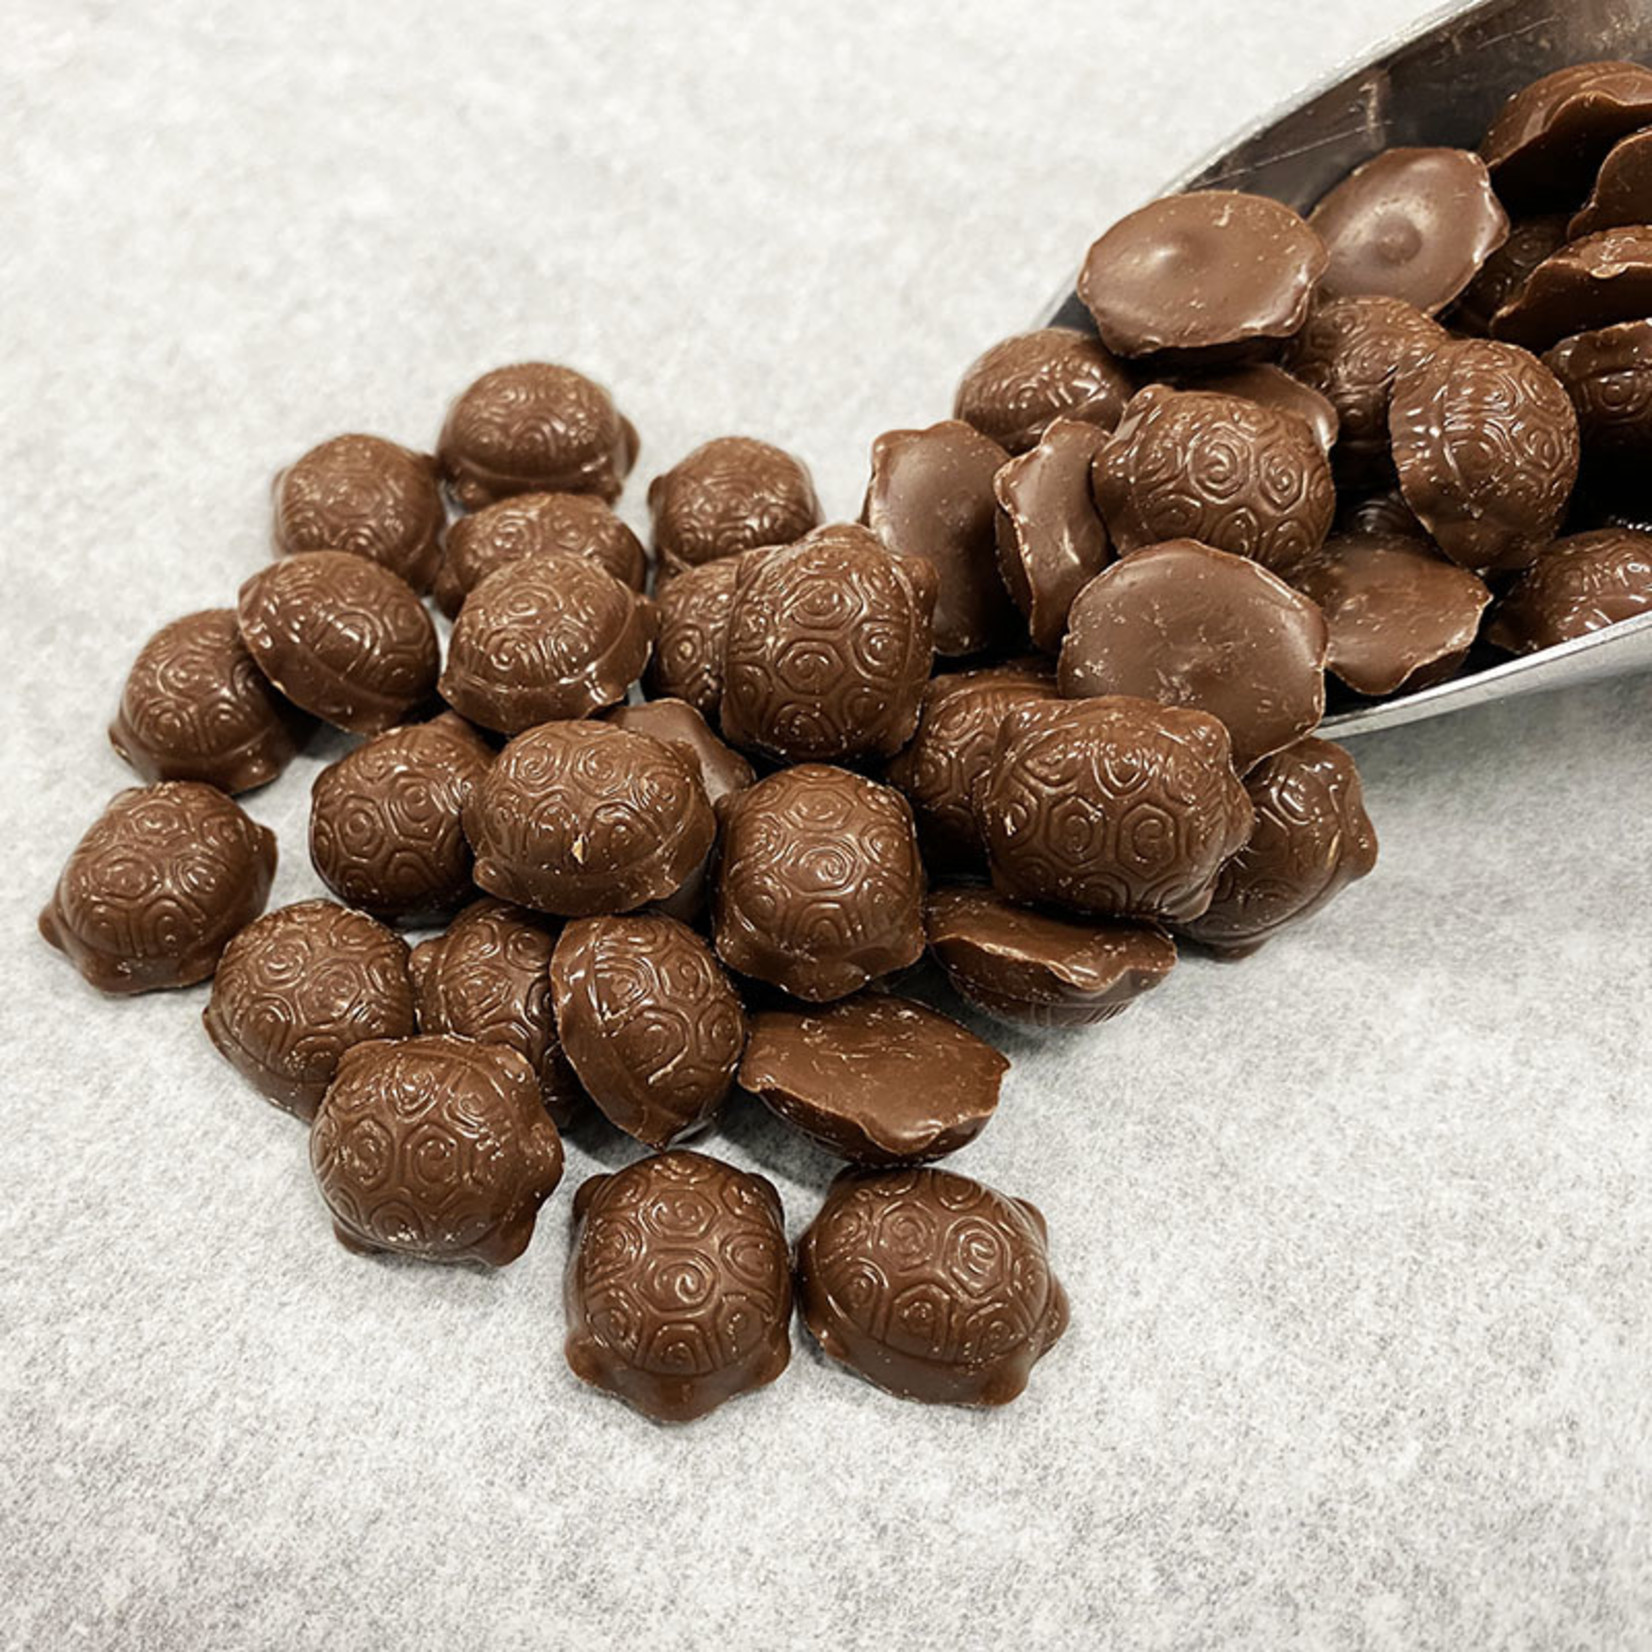 Gertrude Hawk Gertrude Hawk - Milk Chocolate Mini Caramel Turtle, 1 lb - IMM-OS-G200551-E14-R